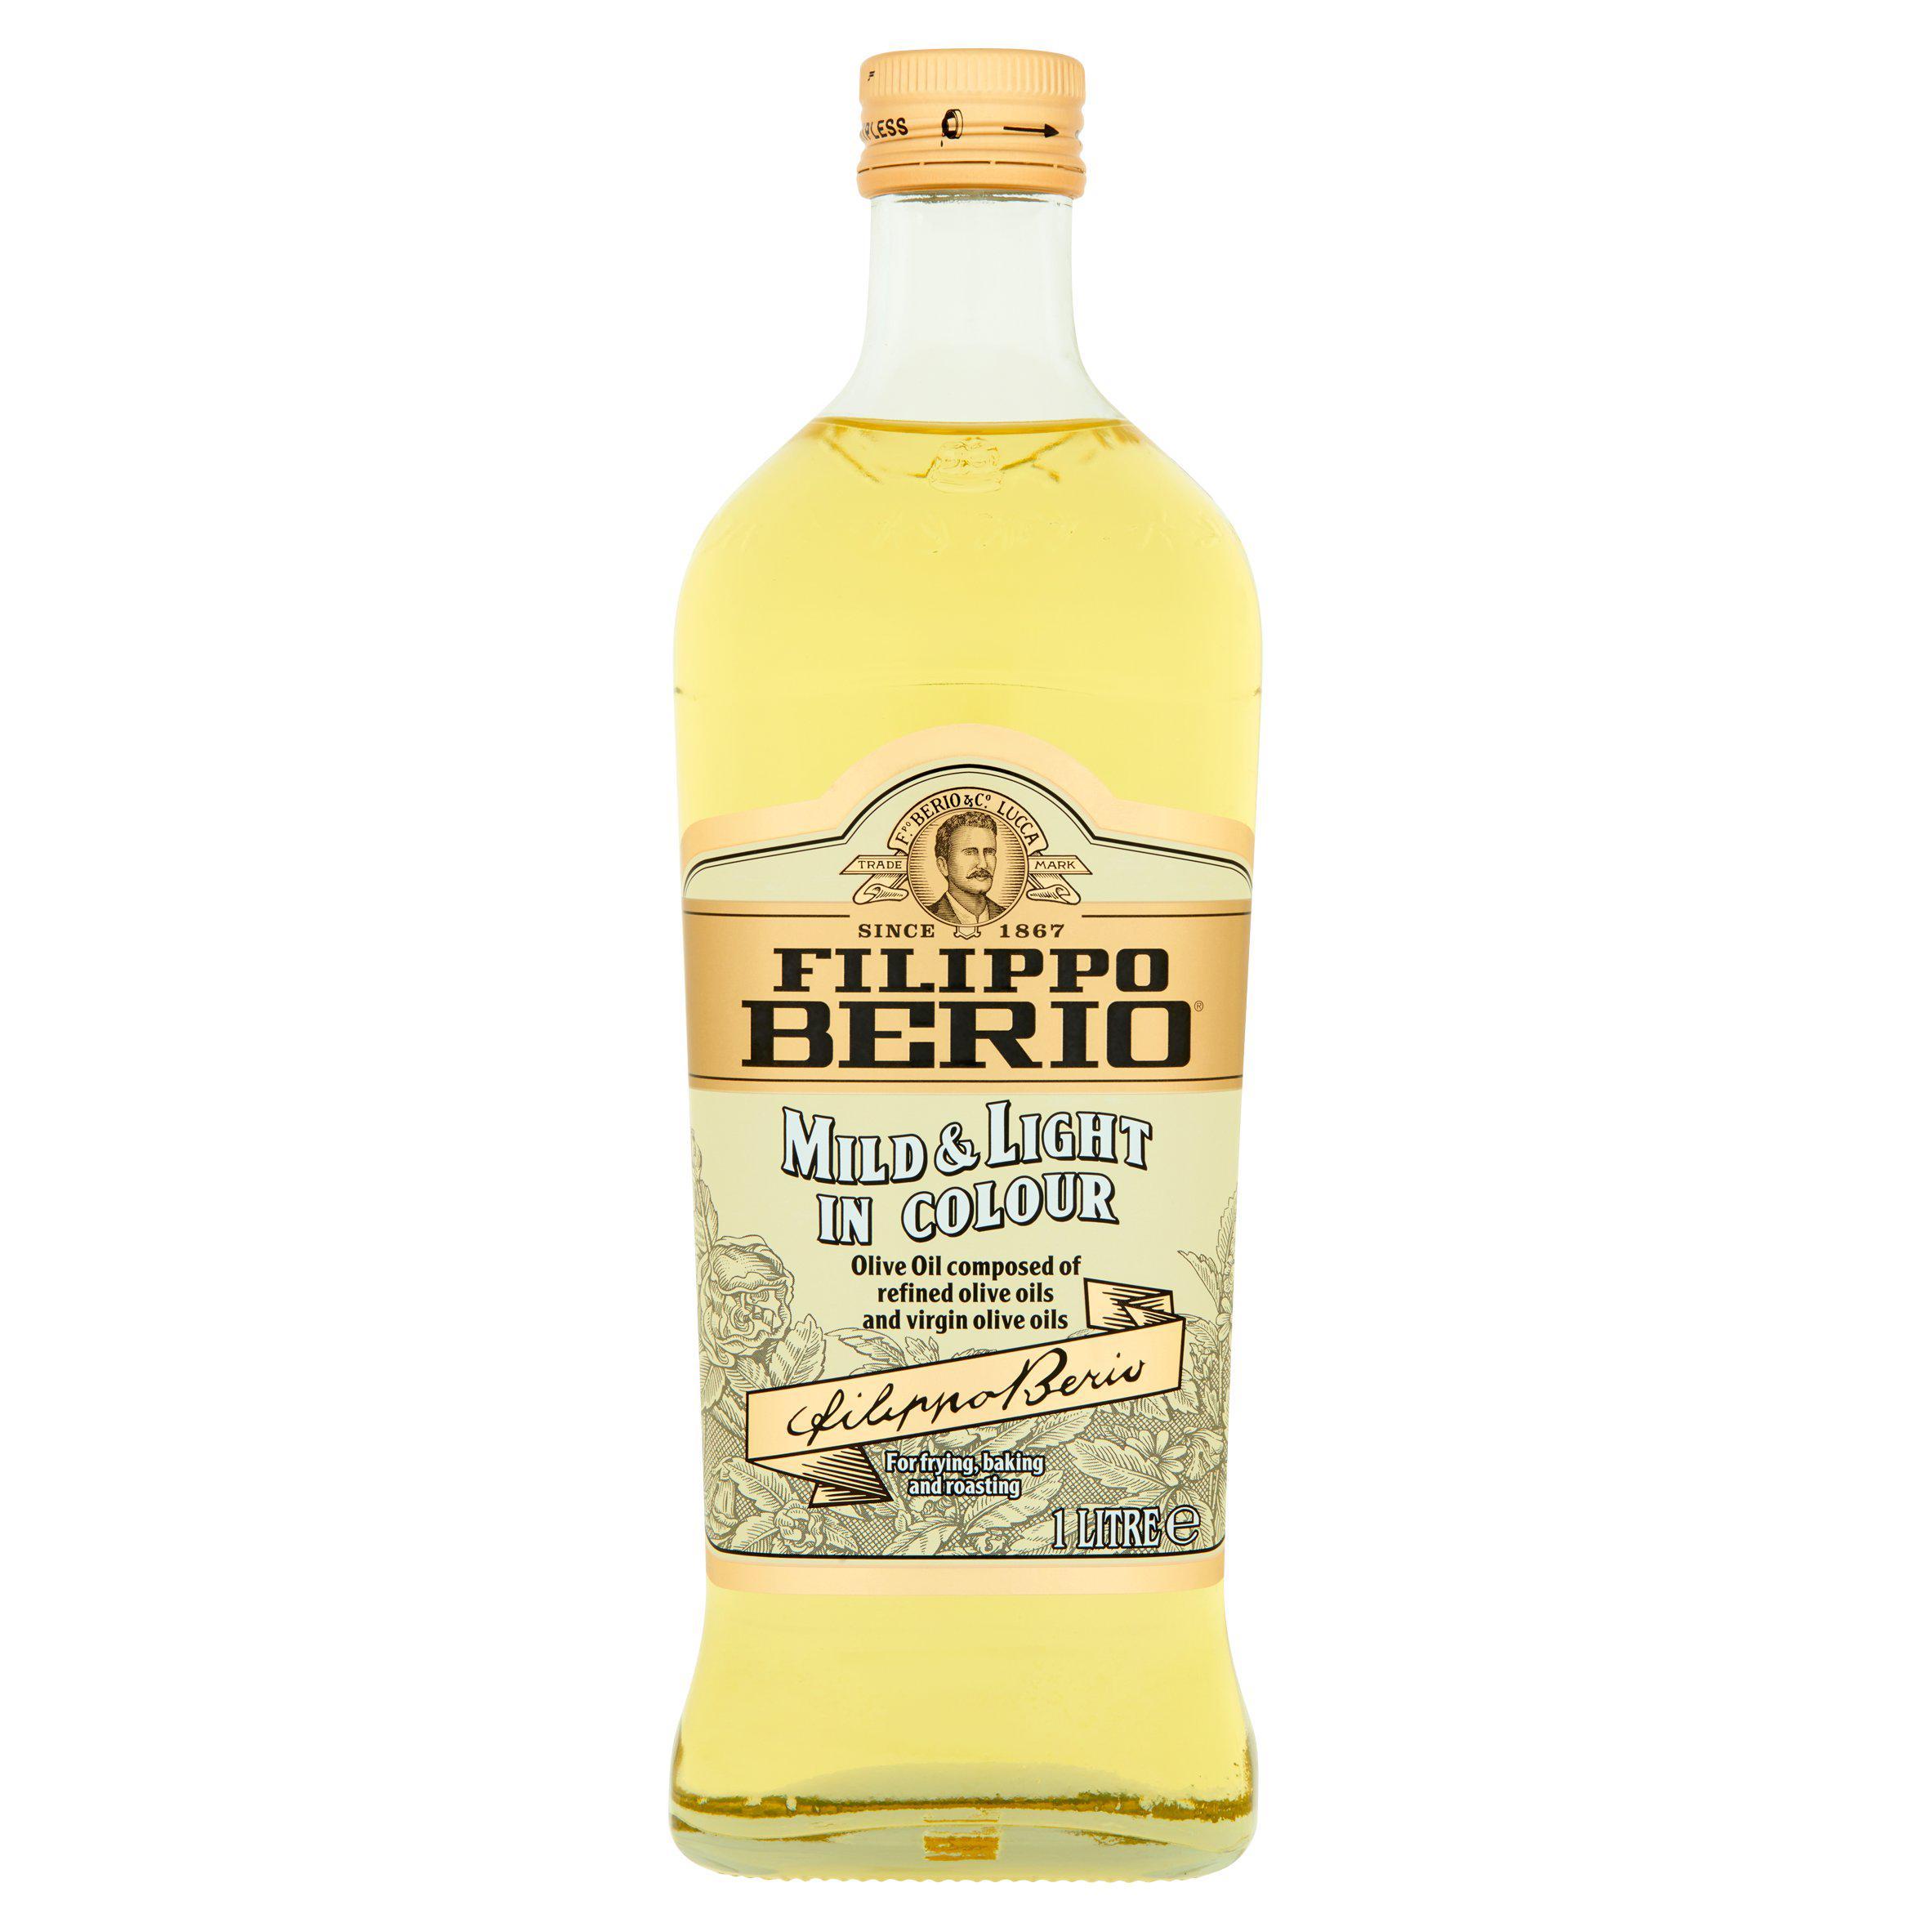 Filippo Berio Mild & Light Olive Oil 1L - £5.50 @ Sainsbury's